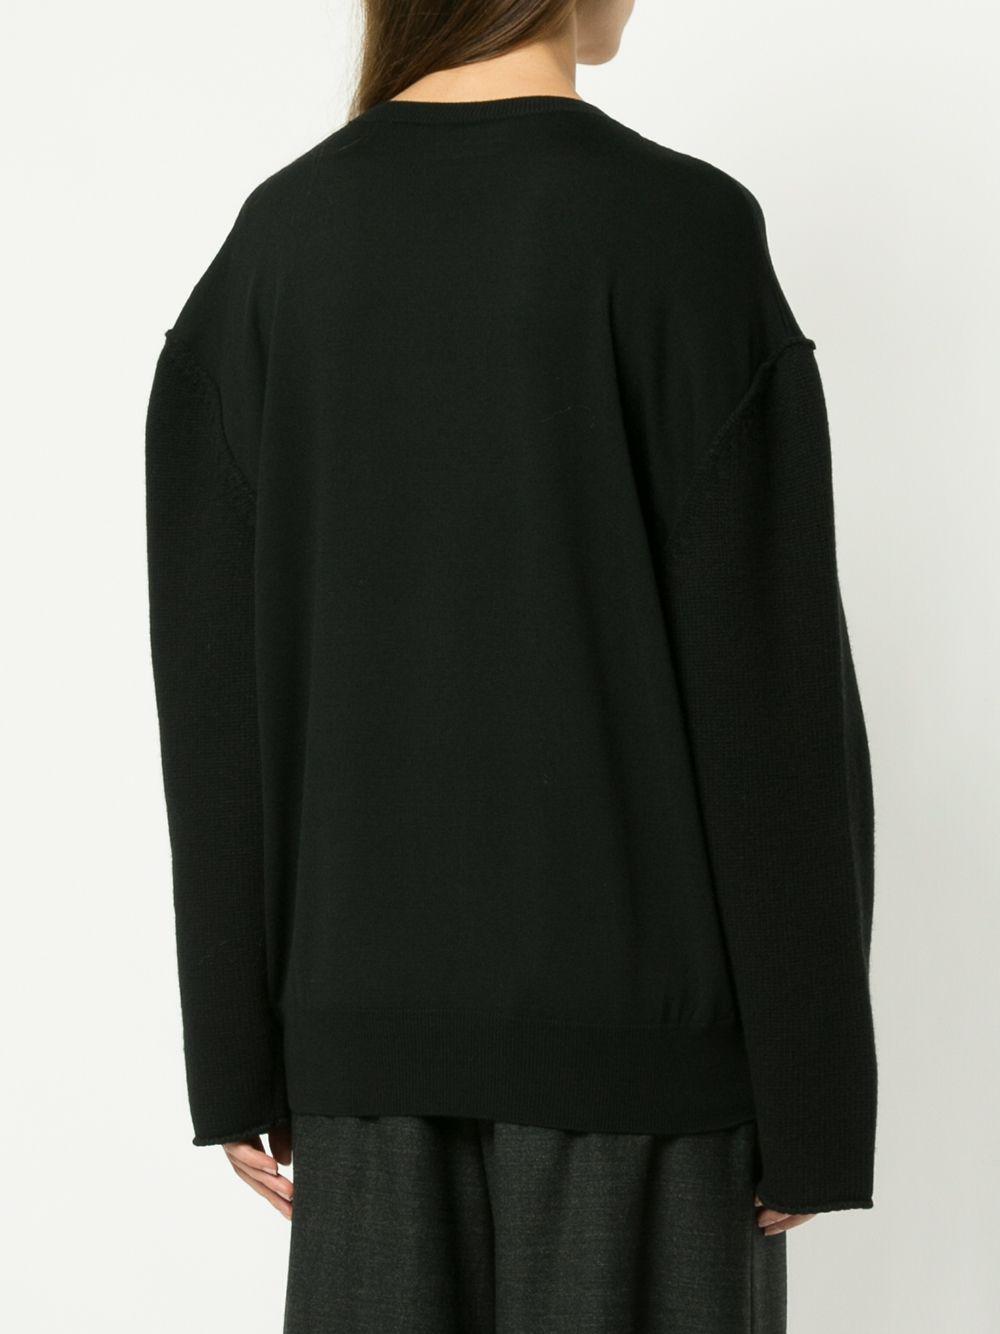 Ports 1961 | свитер с длинными рукавами | Clouty